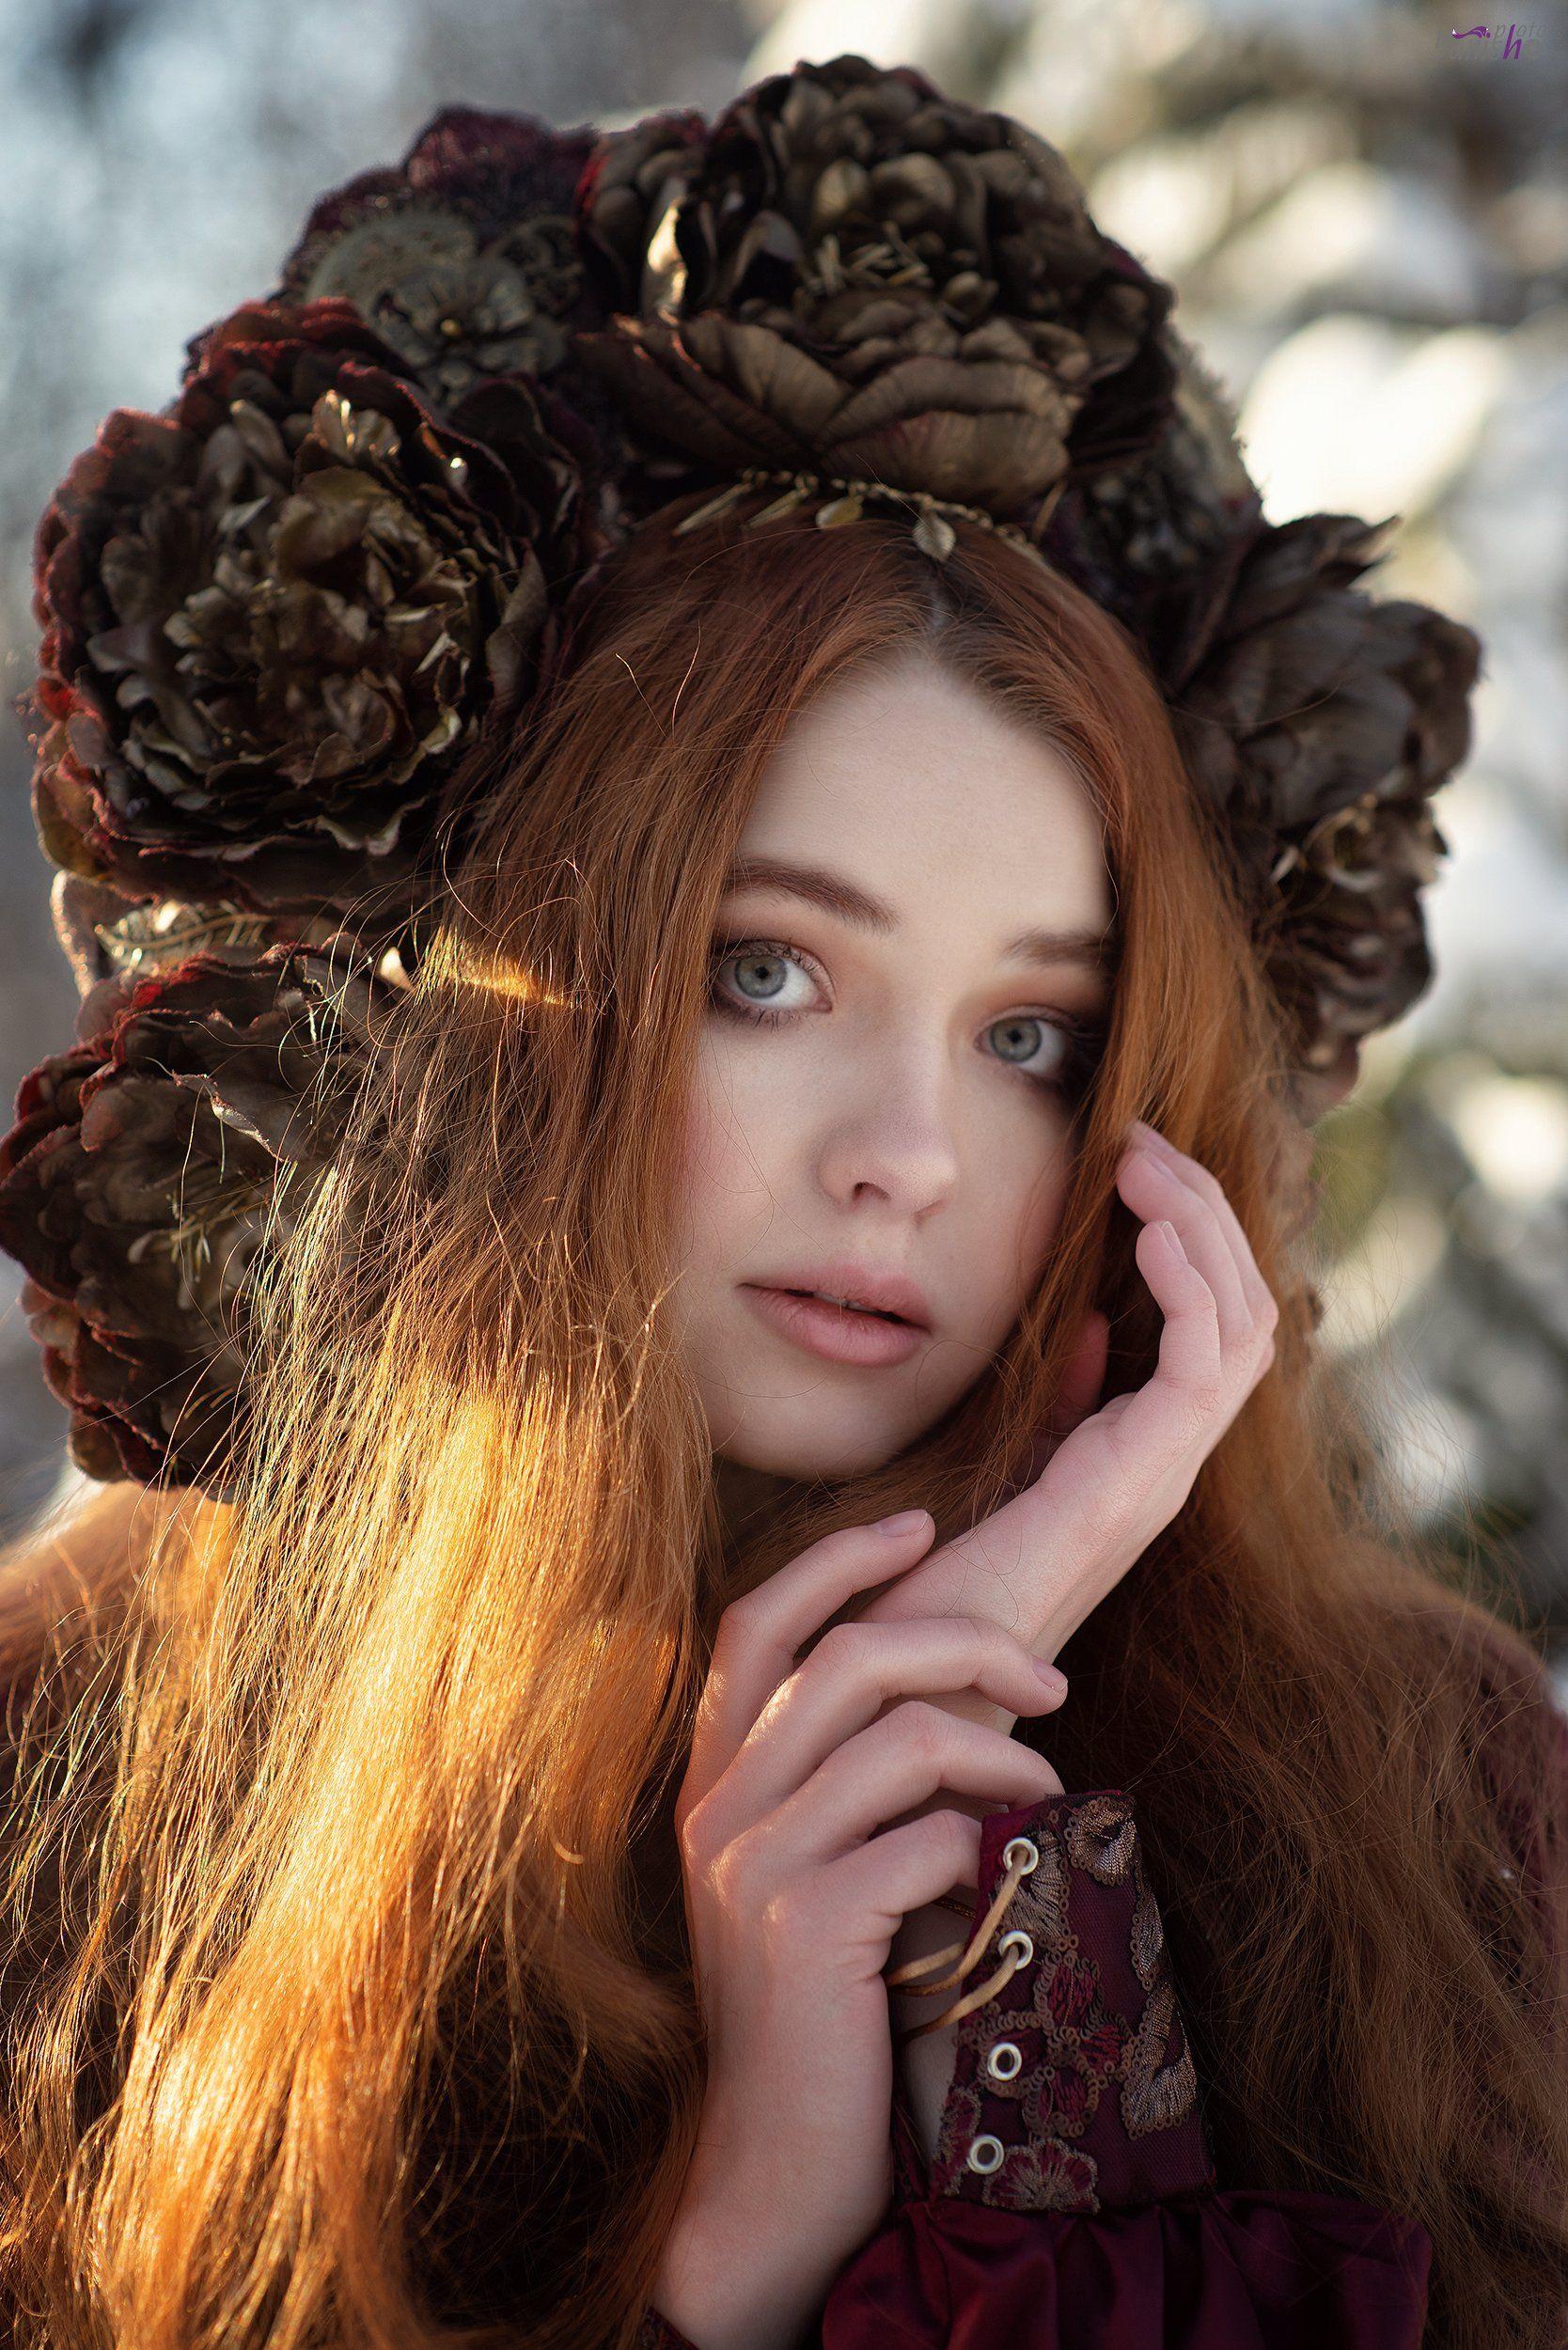 портрет, зима, красный, фентези, девушка, лес, сказка, холод, мороз, Ермакова Янина